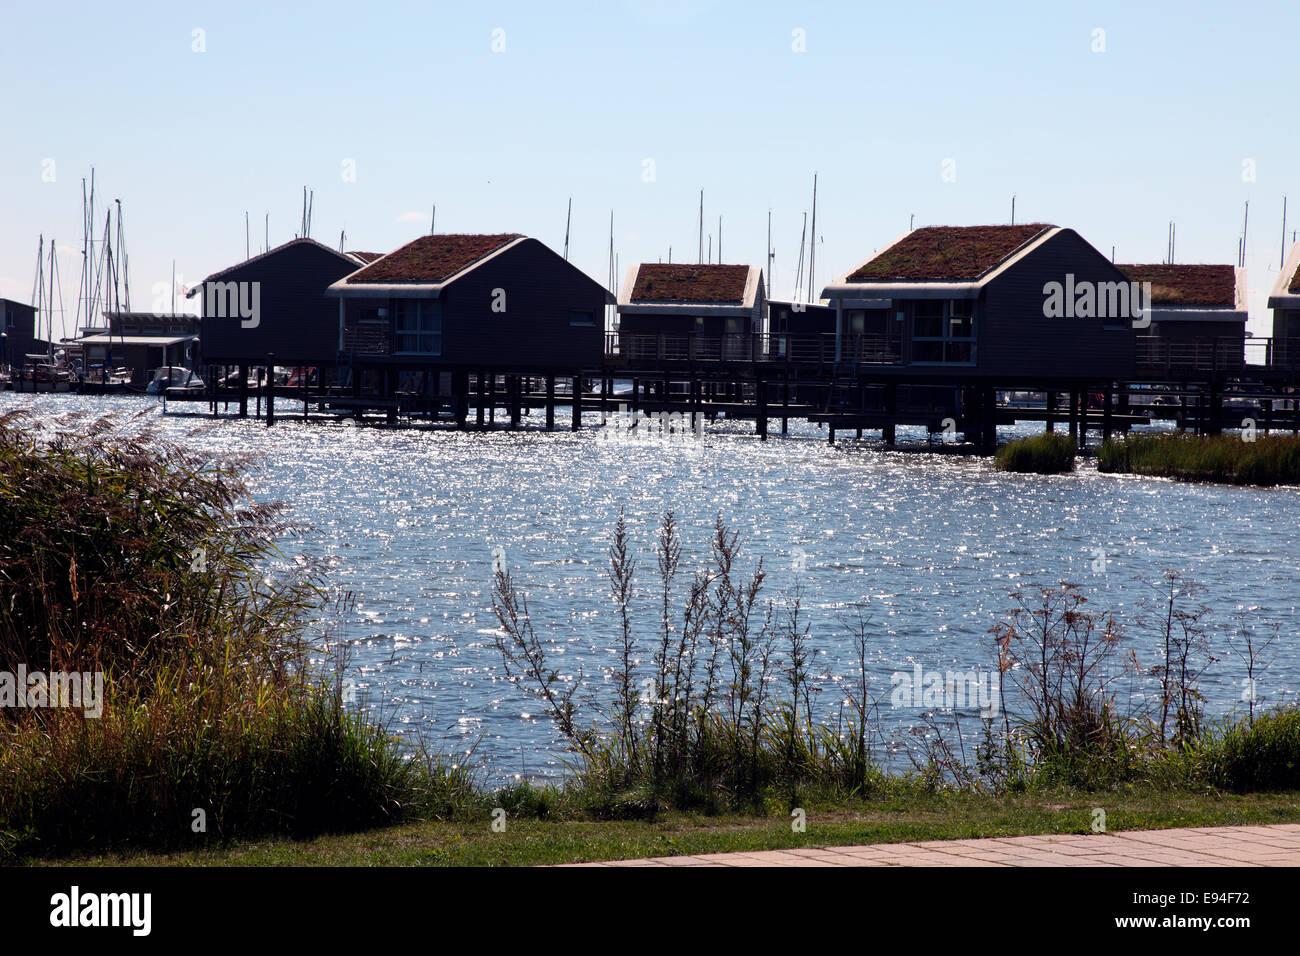 Case vacanza su palafitte all IM Jaich resort village in Lauterbach 46cec38d5a3